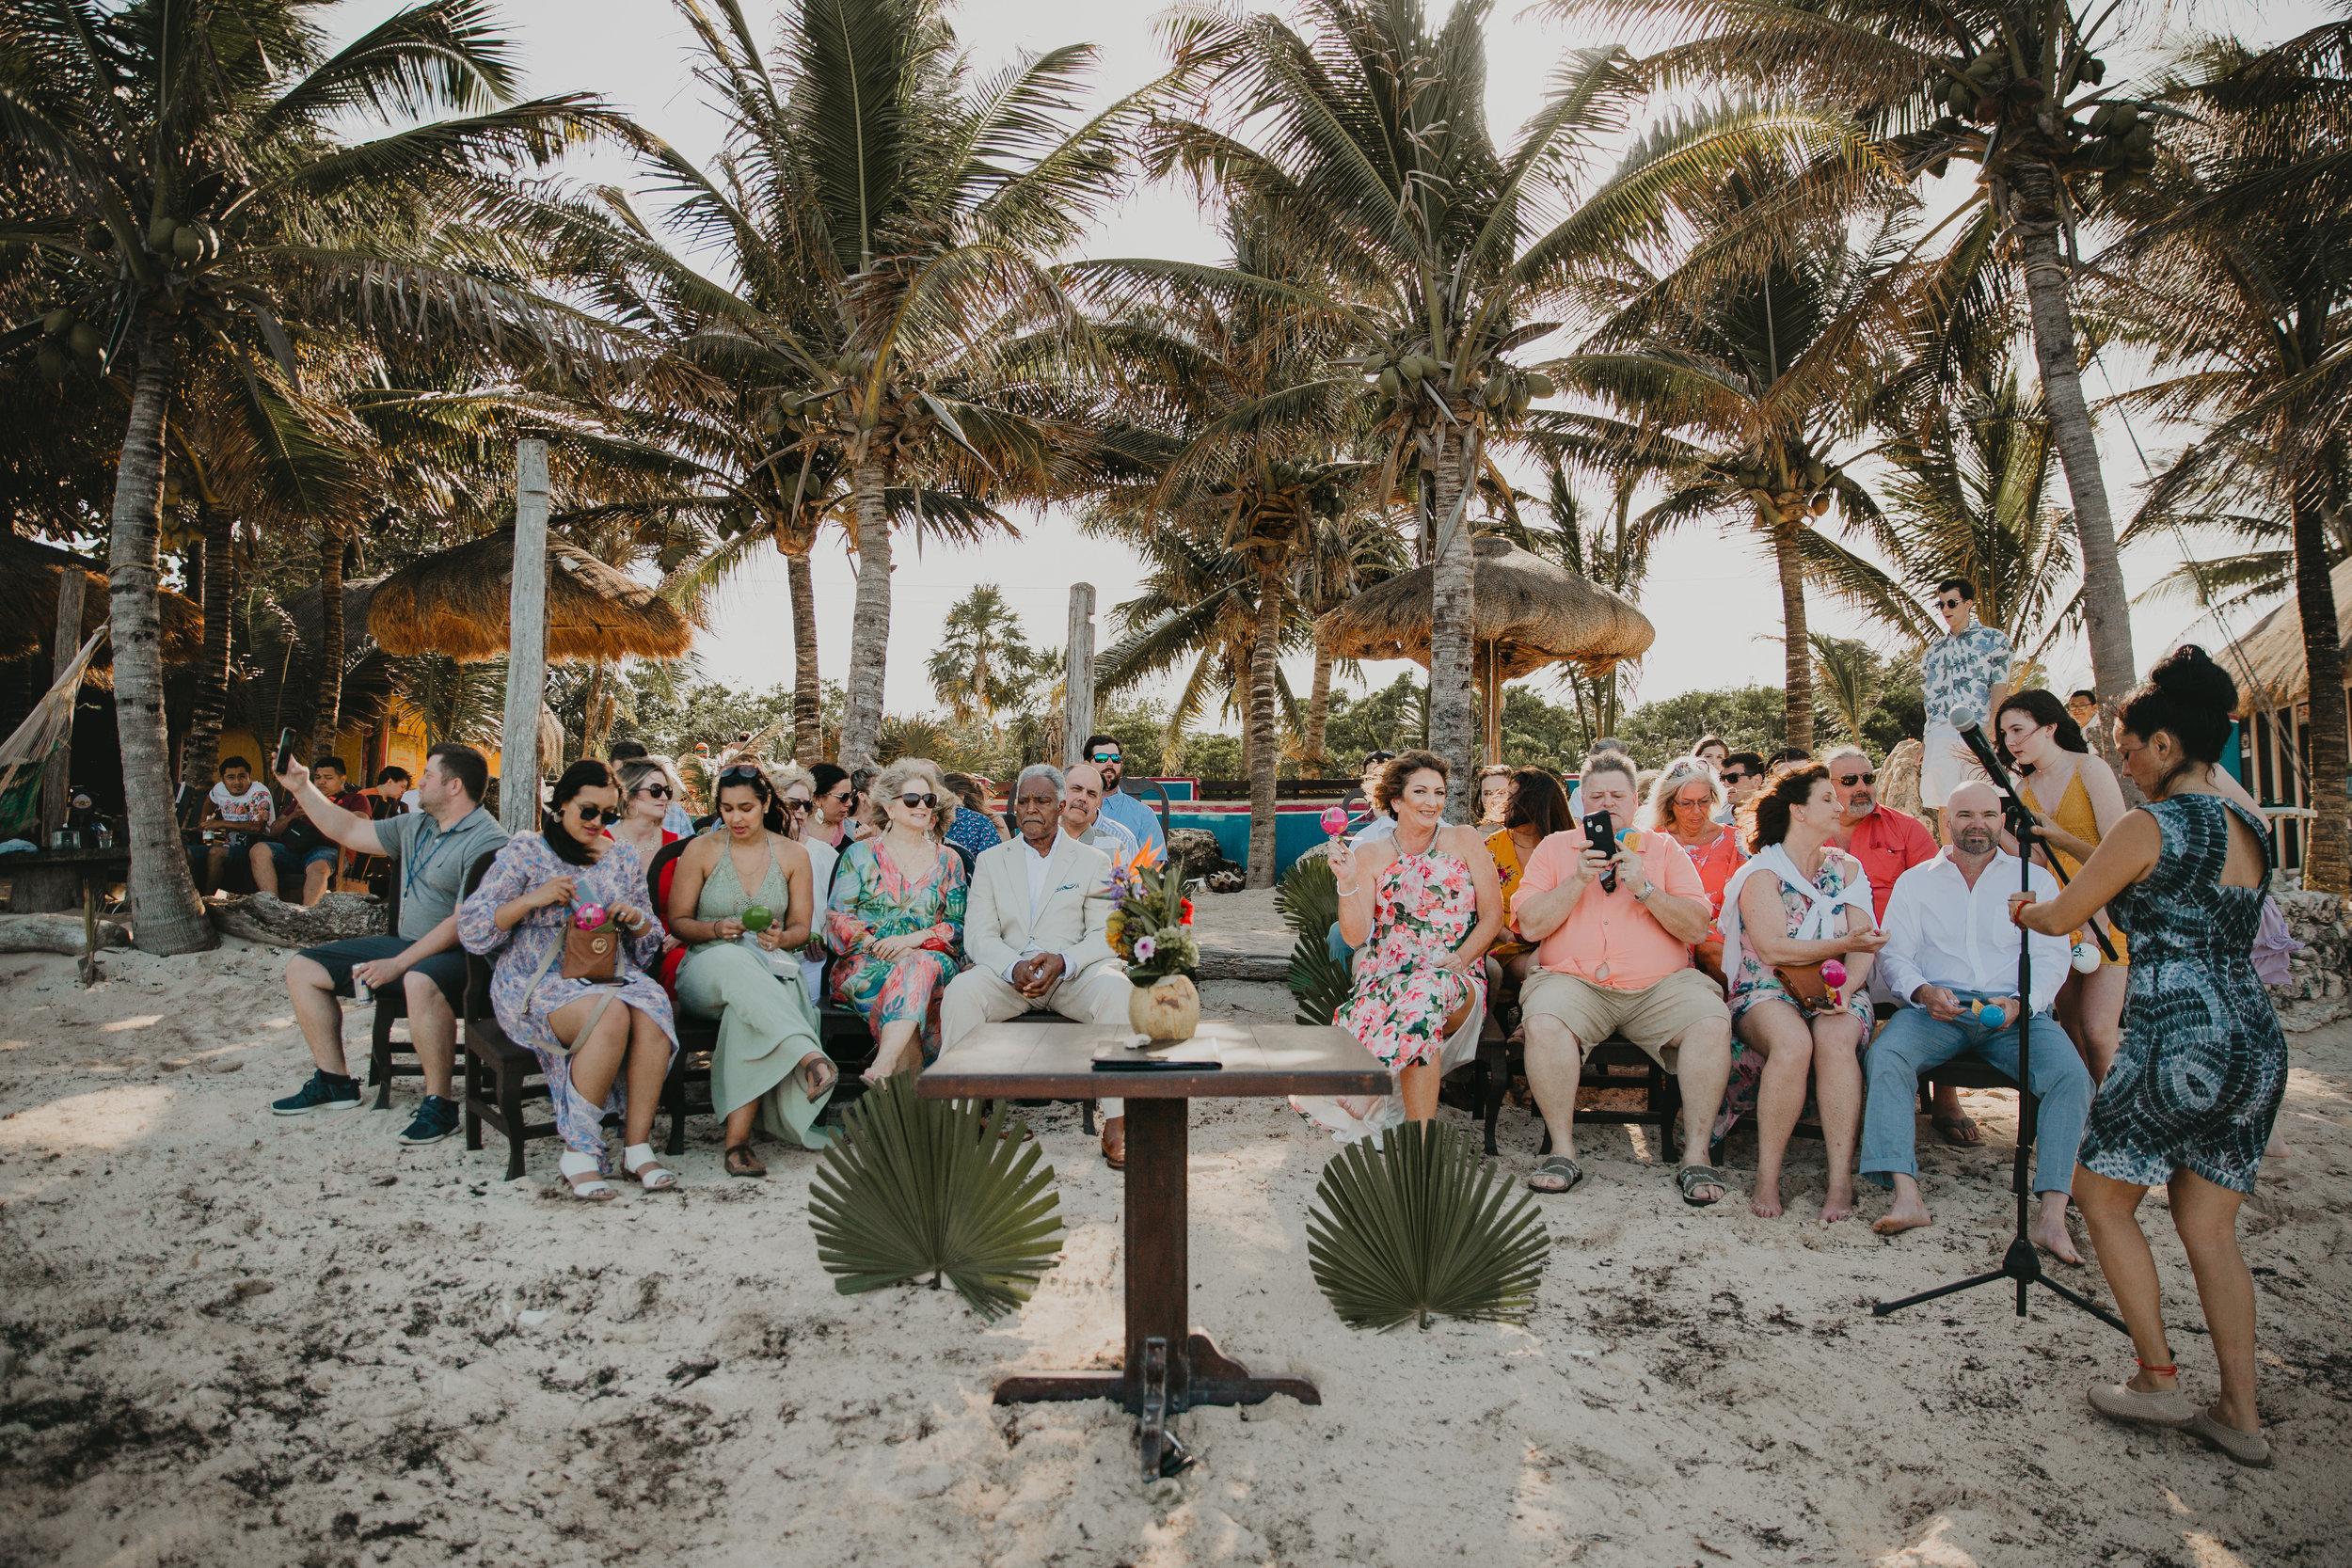 Nicole-Daacke-Photography-beachfront-akumal-destionation-wedding-tulum-mexico-elopement-photographer-destination-wedding-inspiration-sunset-champagne-pop-boho-bride-ocean-tropical-bohemian-tulum-wedding-photos-150.jpg